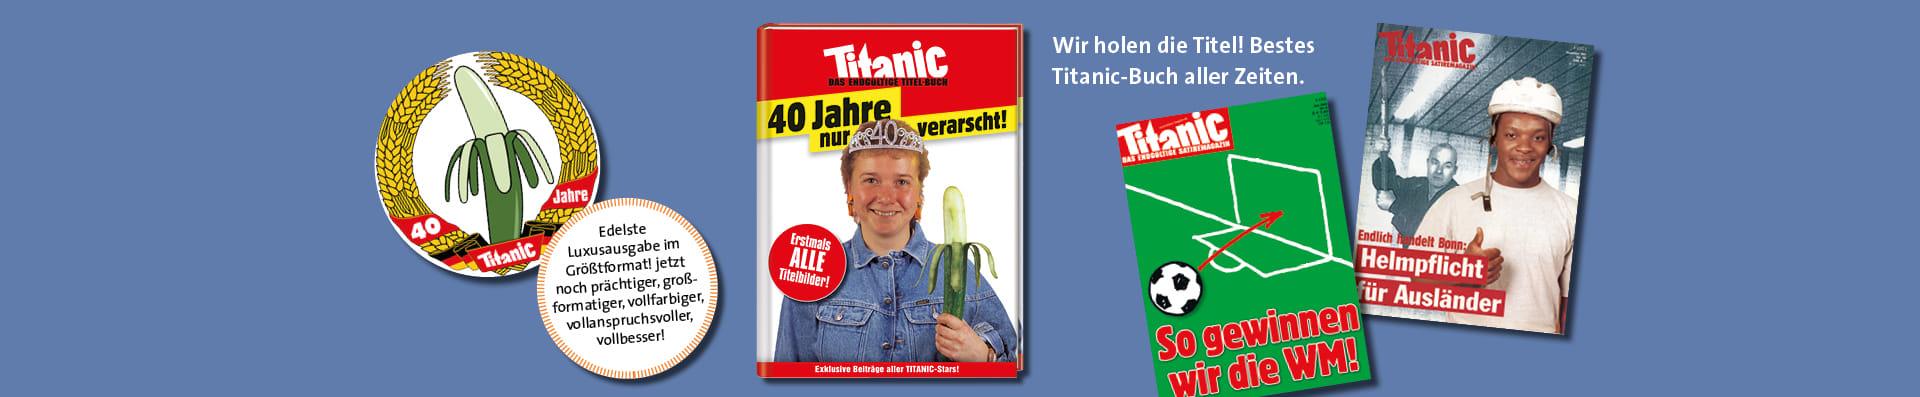 Titanic – das endgültige Titel-Buch